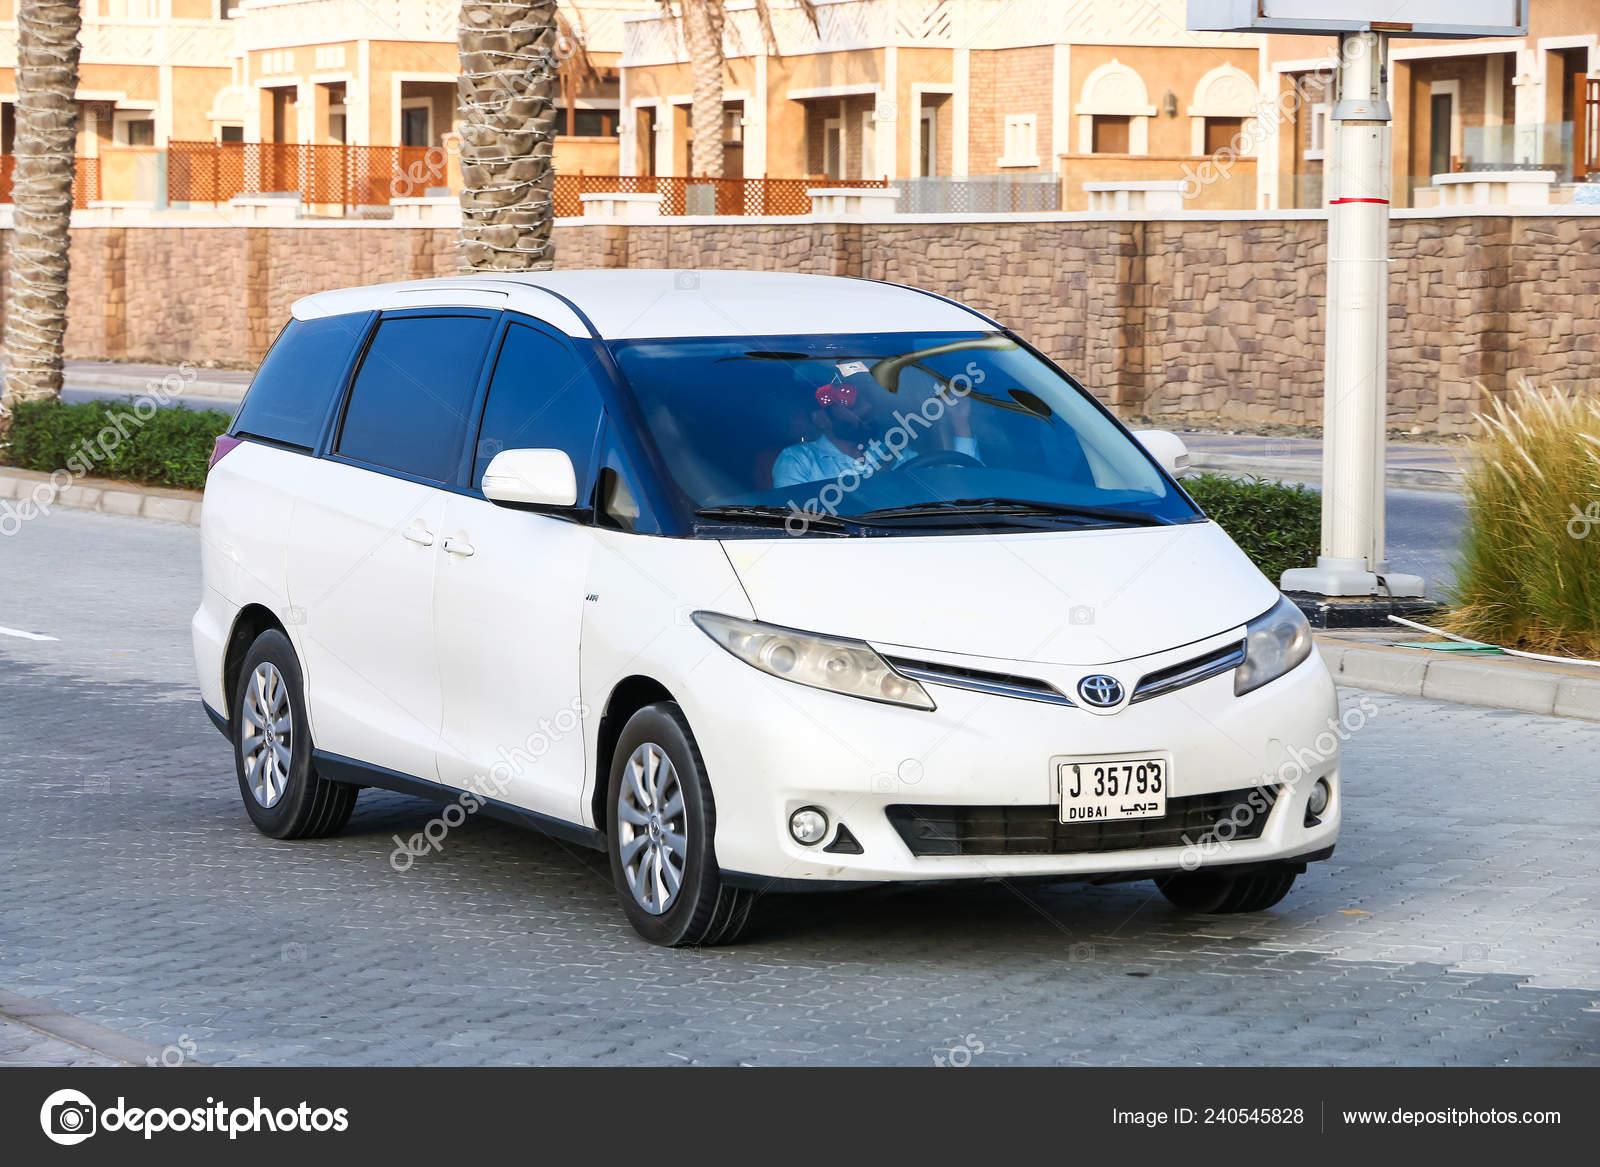 Kelebihan Kekurangan Toyota Previa 2018 Murah Berkualitas